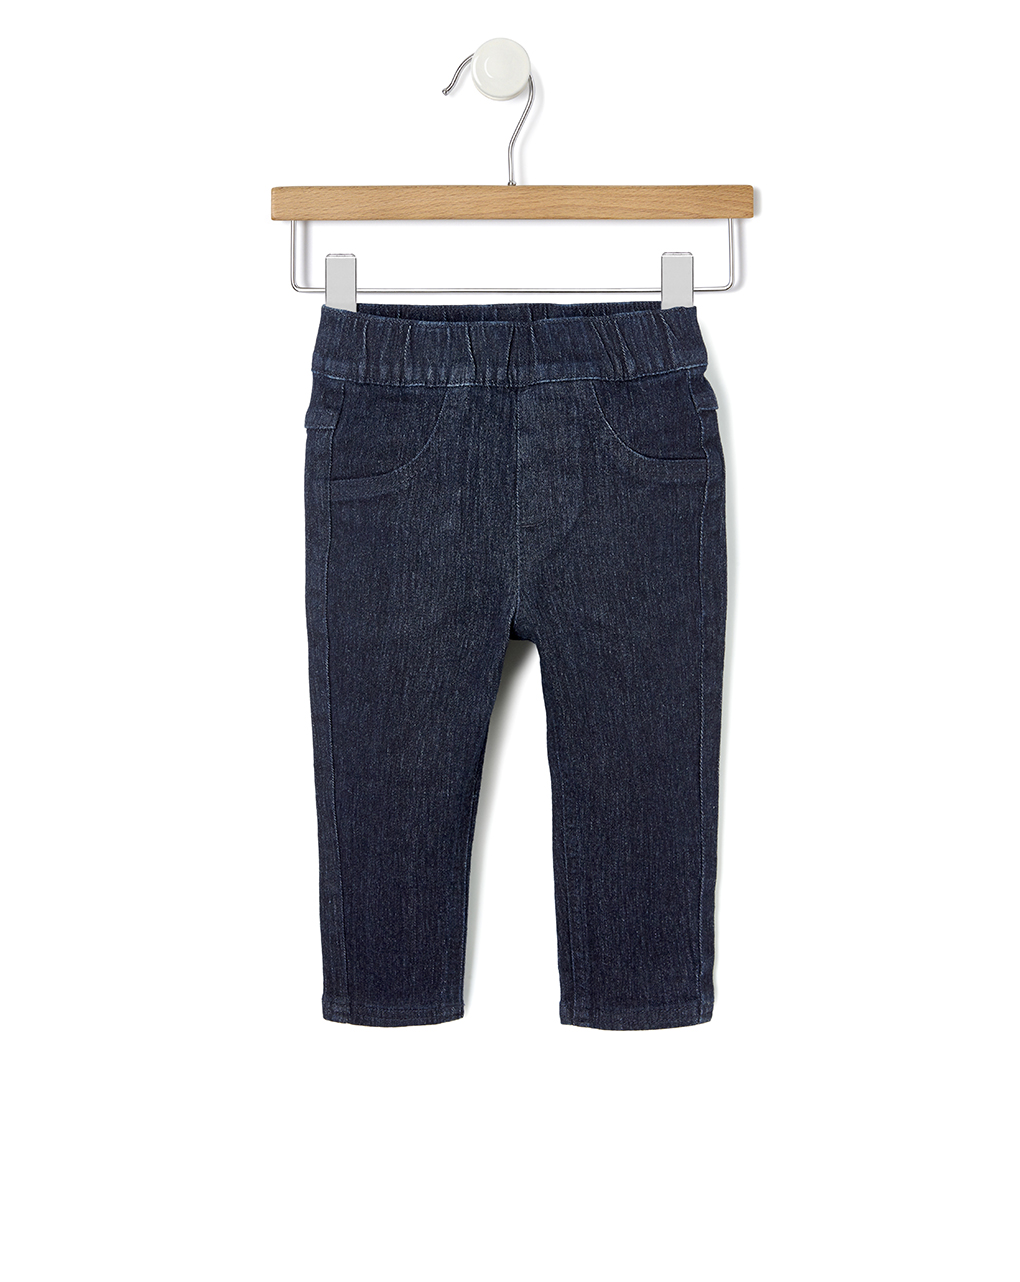 Pantaloni in denim blu scuro - Prénatal